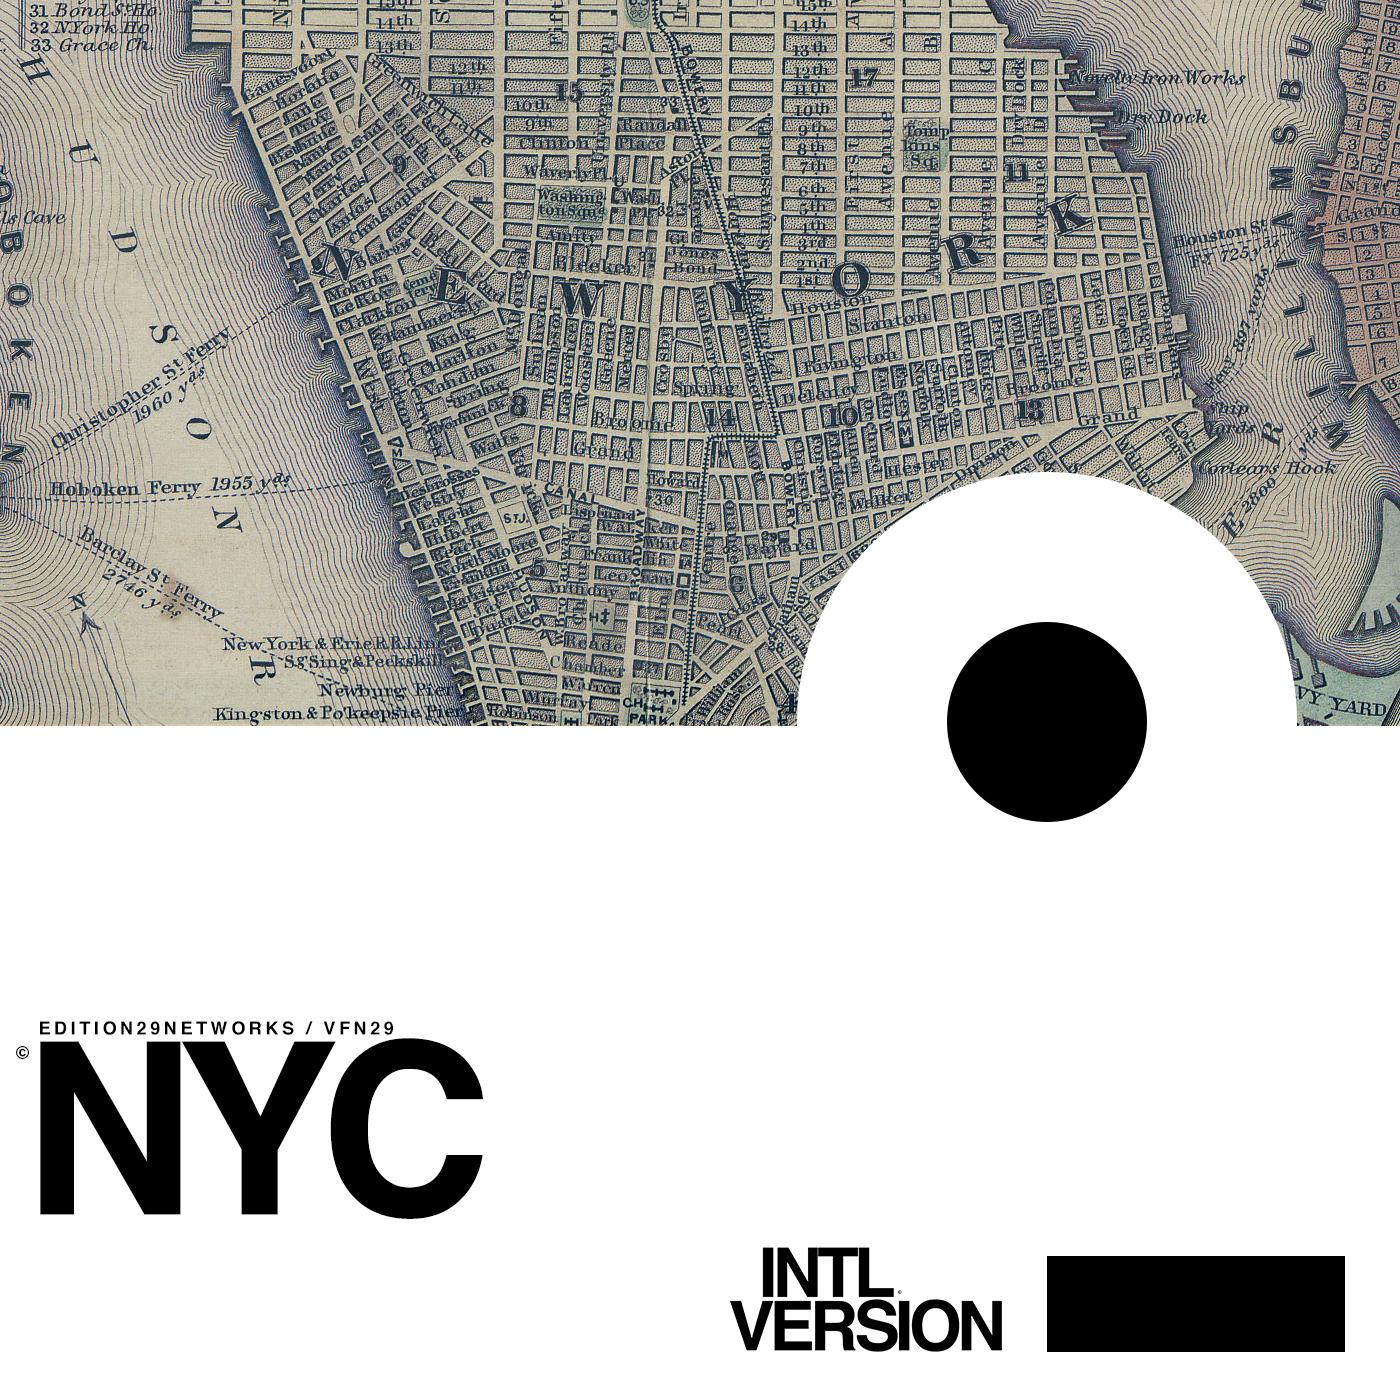 NYC / INTL VERSION